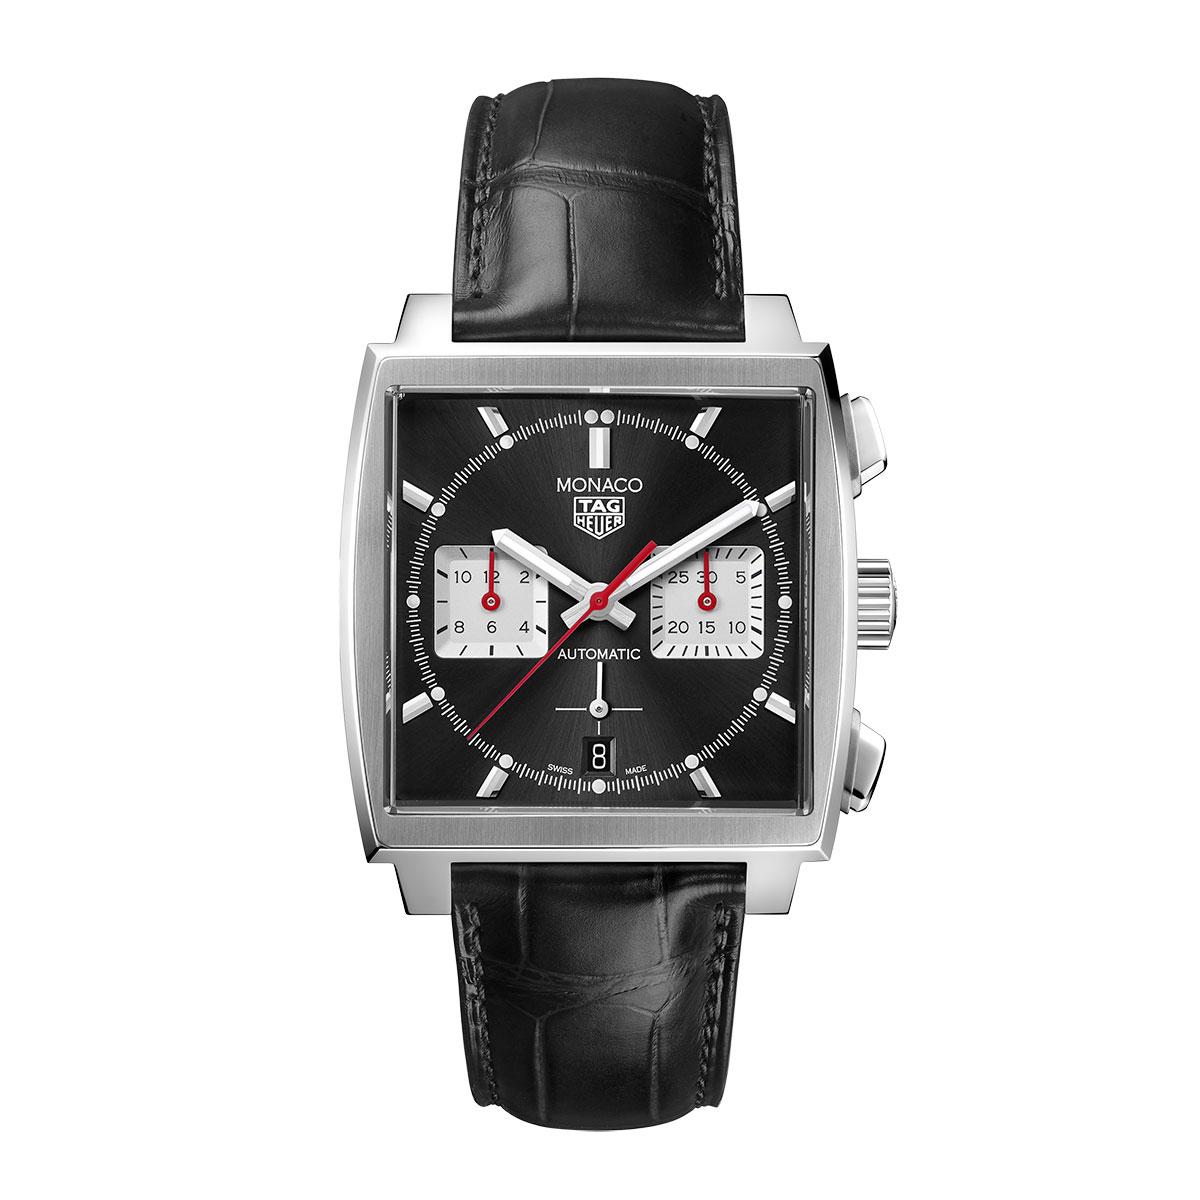 TAG Heuer Monaco Chronograph Watch